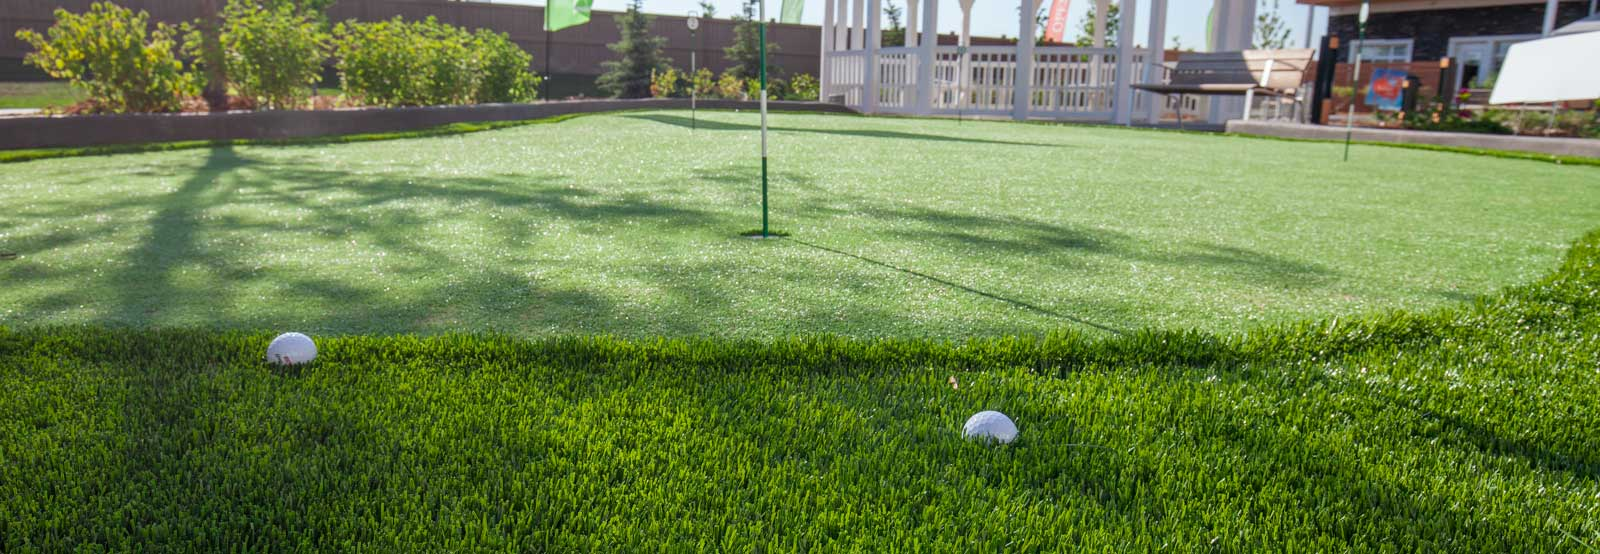 Artificial Turf Grass Edmonton | Backyard Golf Putting ...